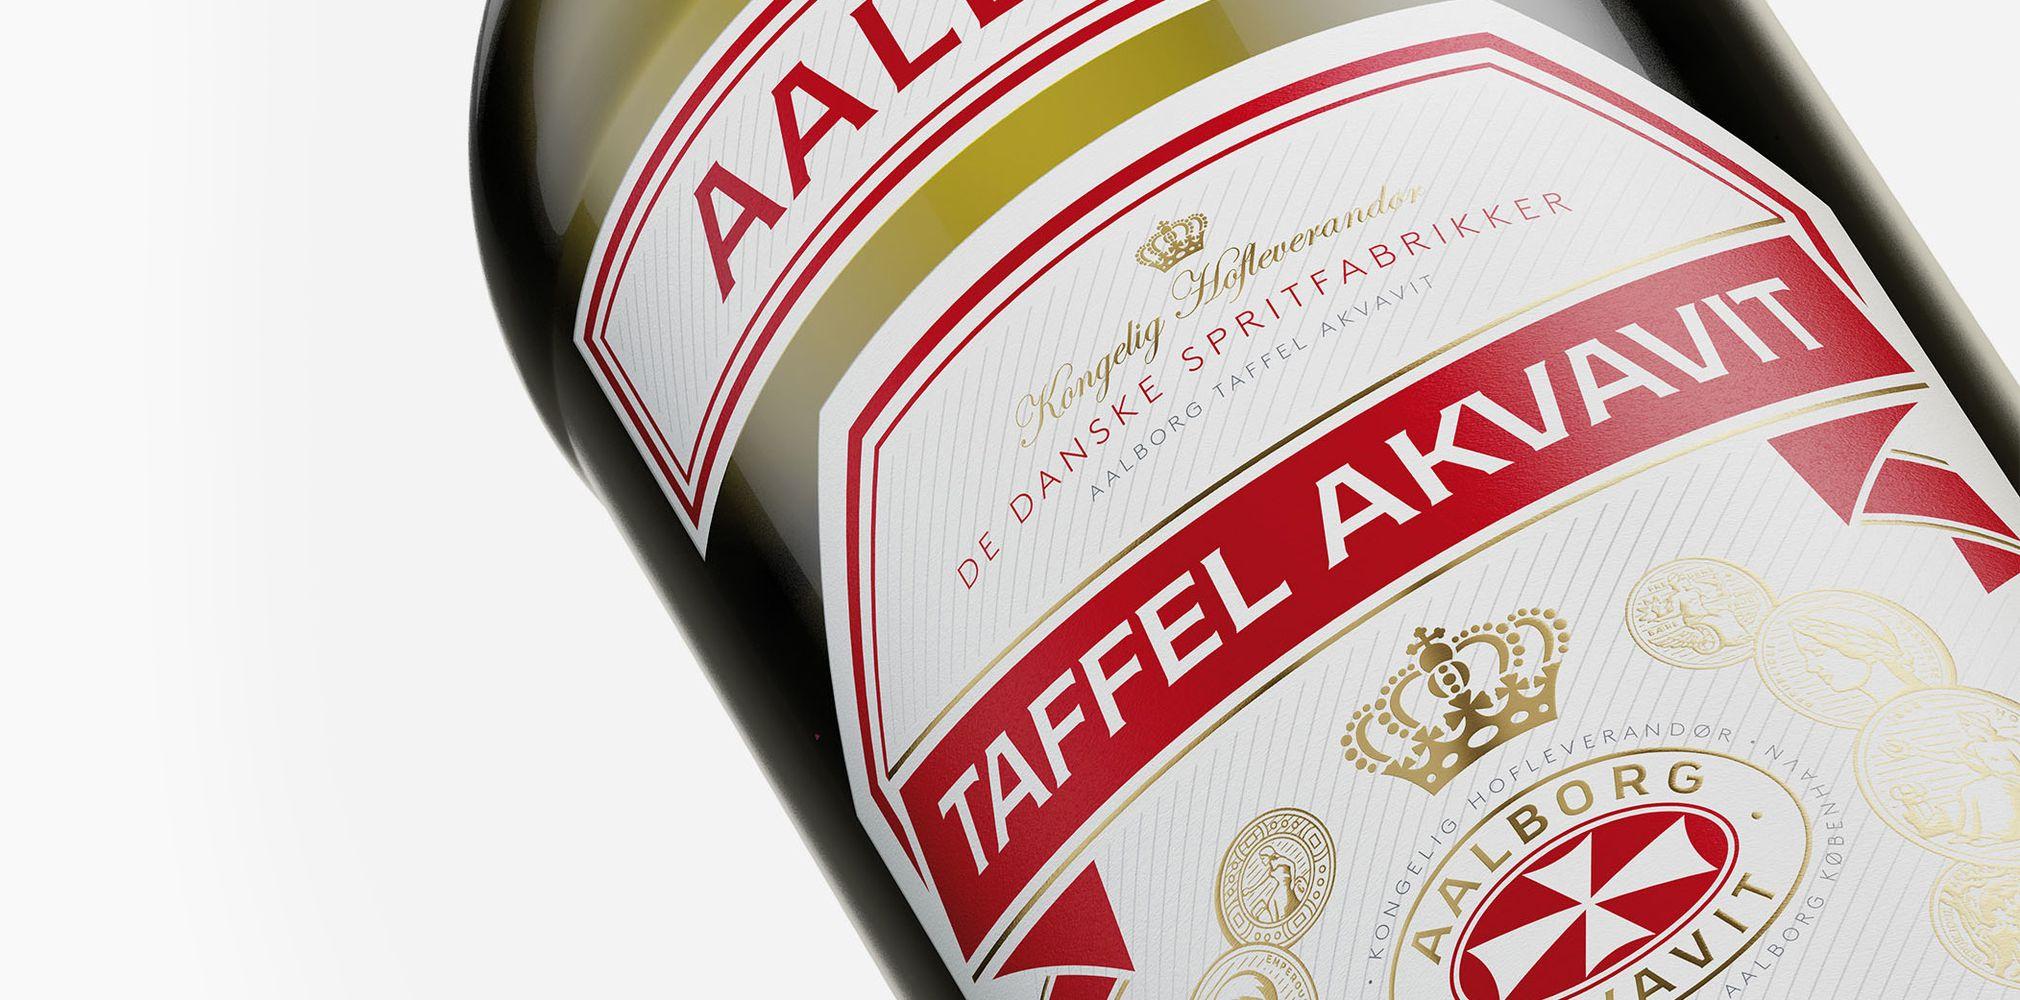 What Is Akvavit Wine Cellar Finland Scandinavia